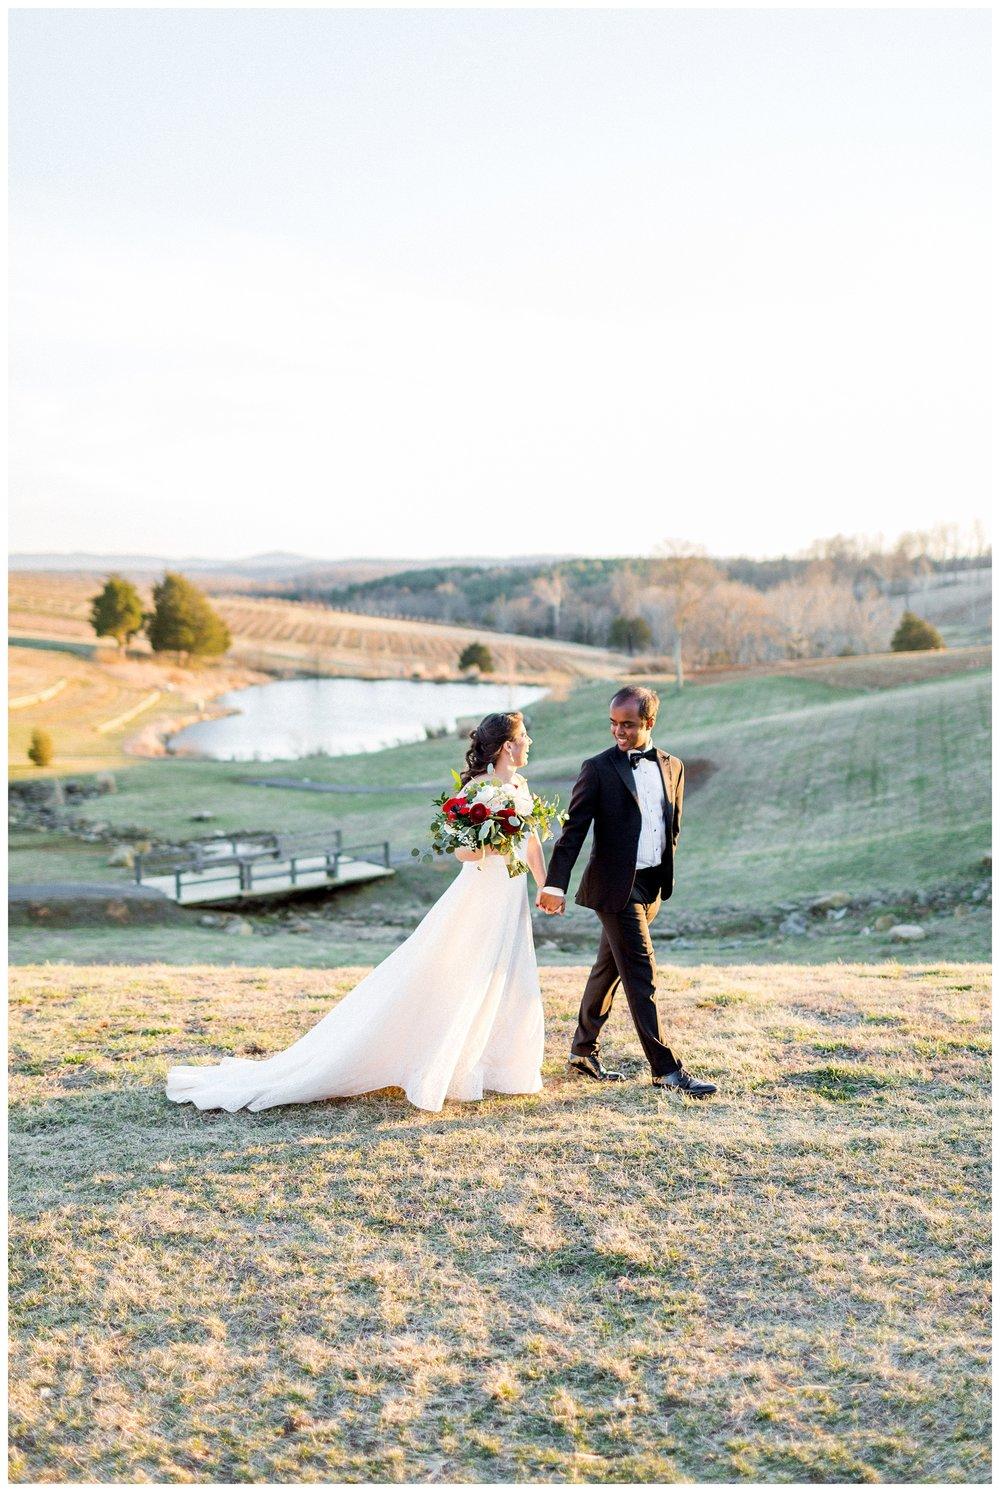 Stone Tower Winery Wedding | Virginia Winter Wedding | VA Wedding Photographer Kir Tuben_0100.jpg